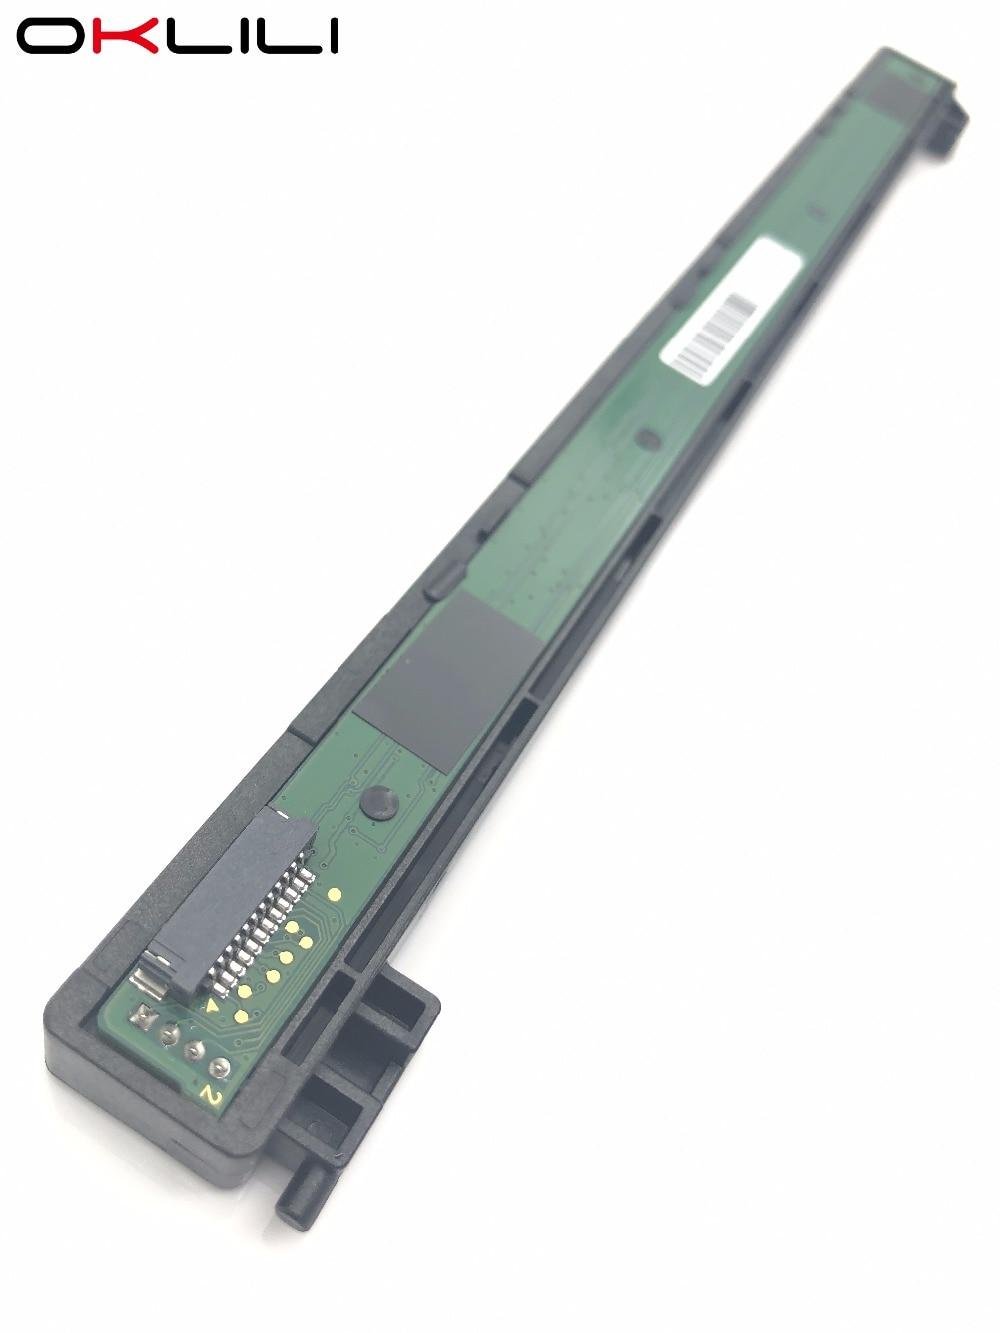 5X 0609-001409 CONTACT IMAGE SENSOR CIS Scanner Head For Samsung SL- M2020 M2070 M2625 M2670 M2675 M2825 M2870 M2875 M2880 M2885